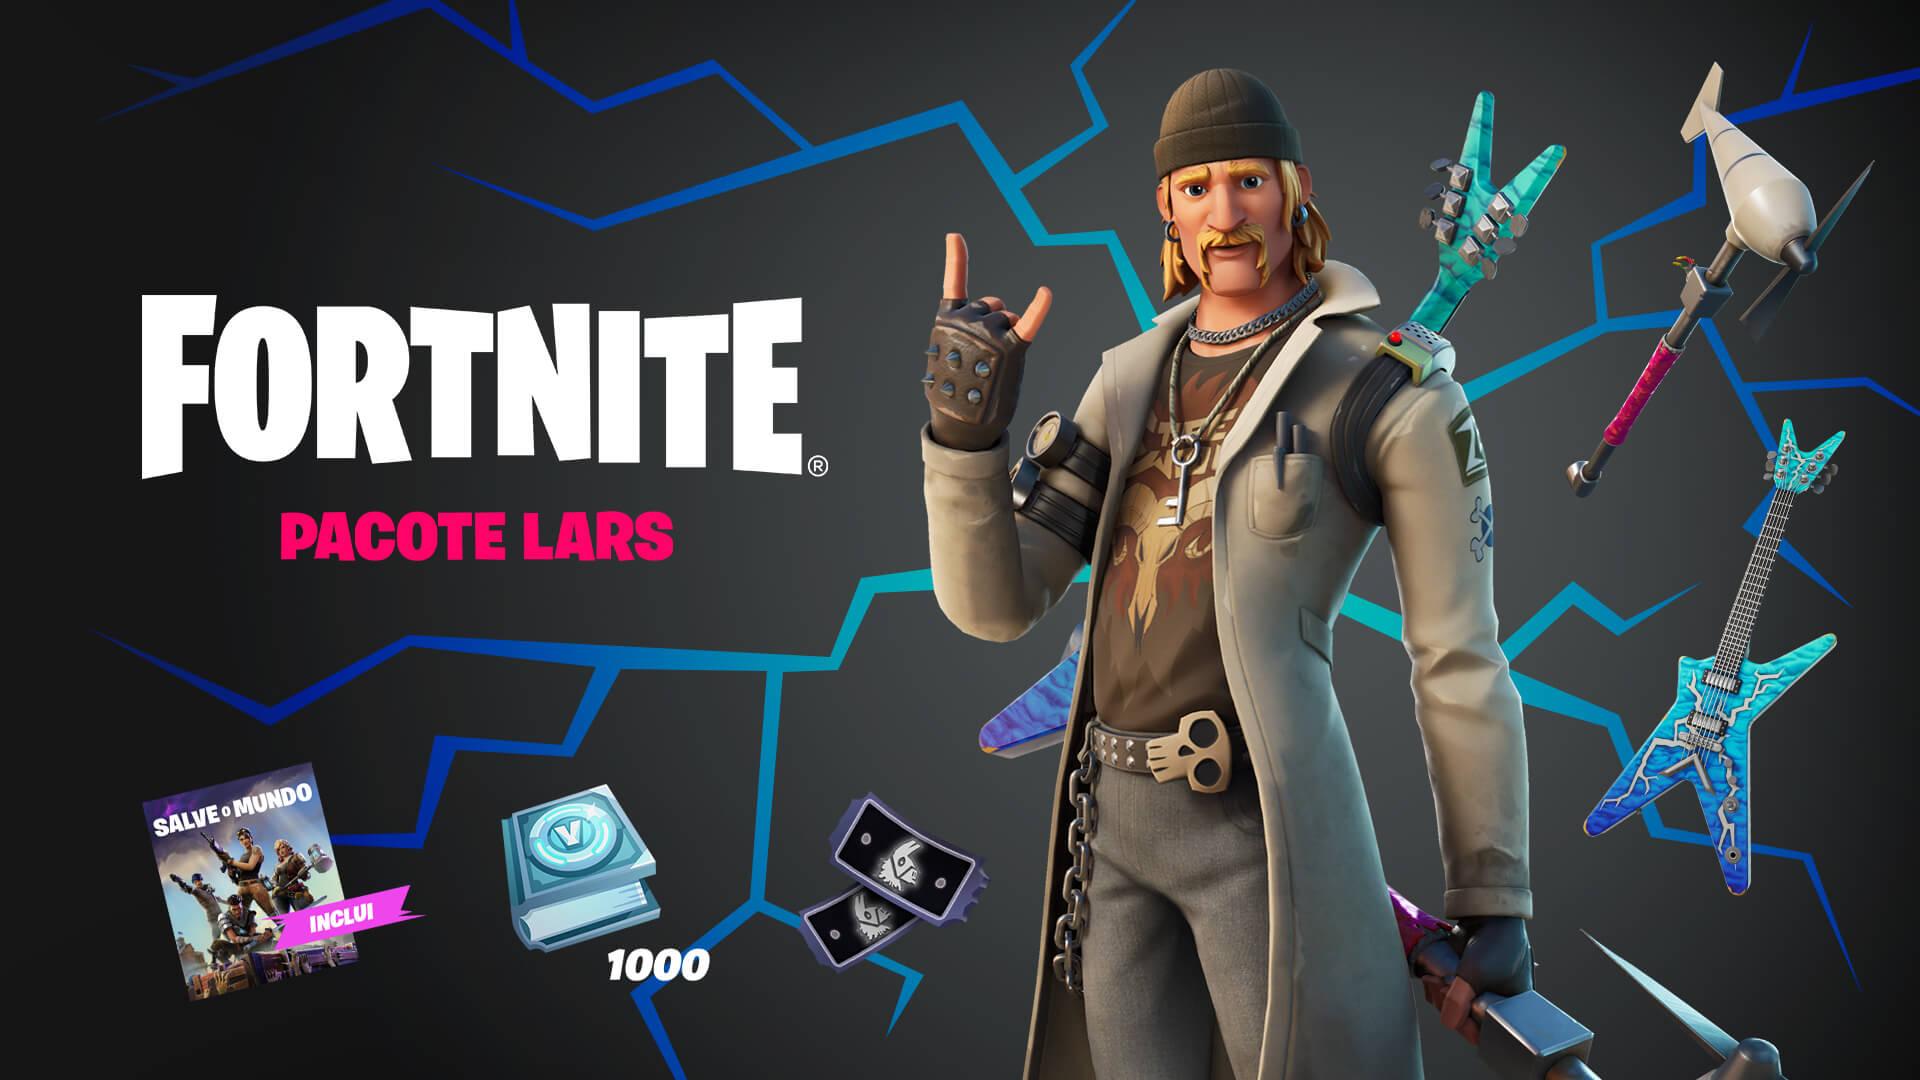 PTBR Fortnite Save the World Lars Pack